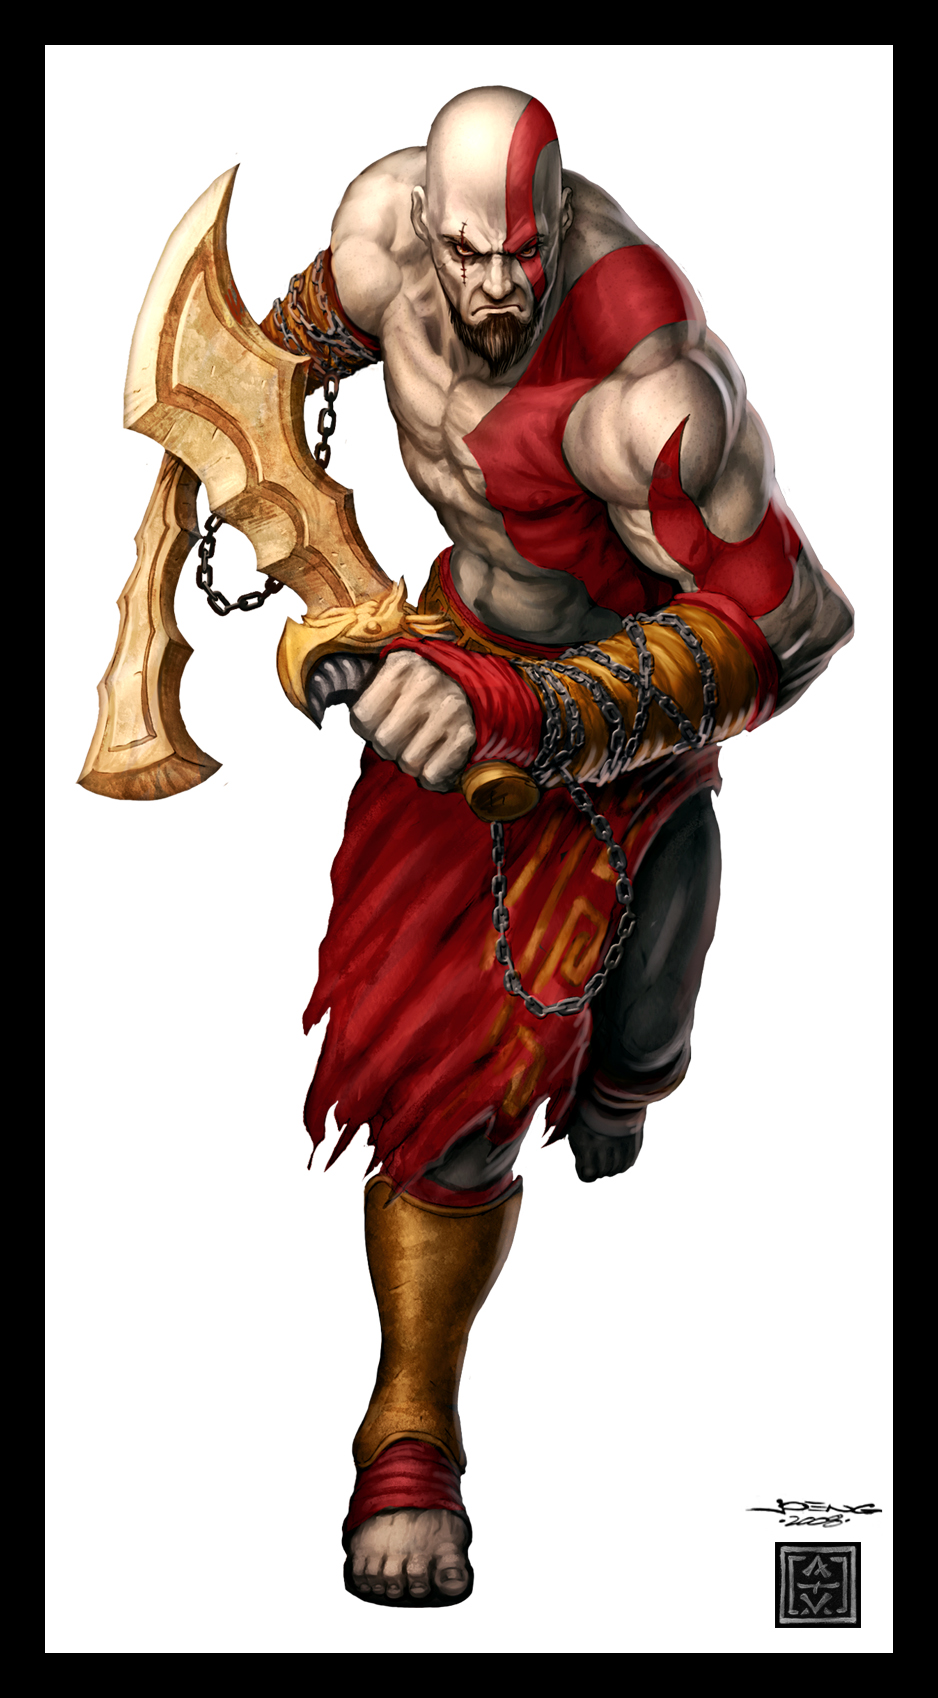 Pide tu personaje. V1 - Página 2 GamePro_Cover__Kratos_by_VegasMike